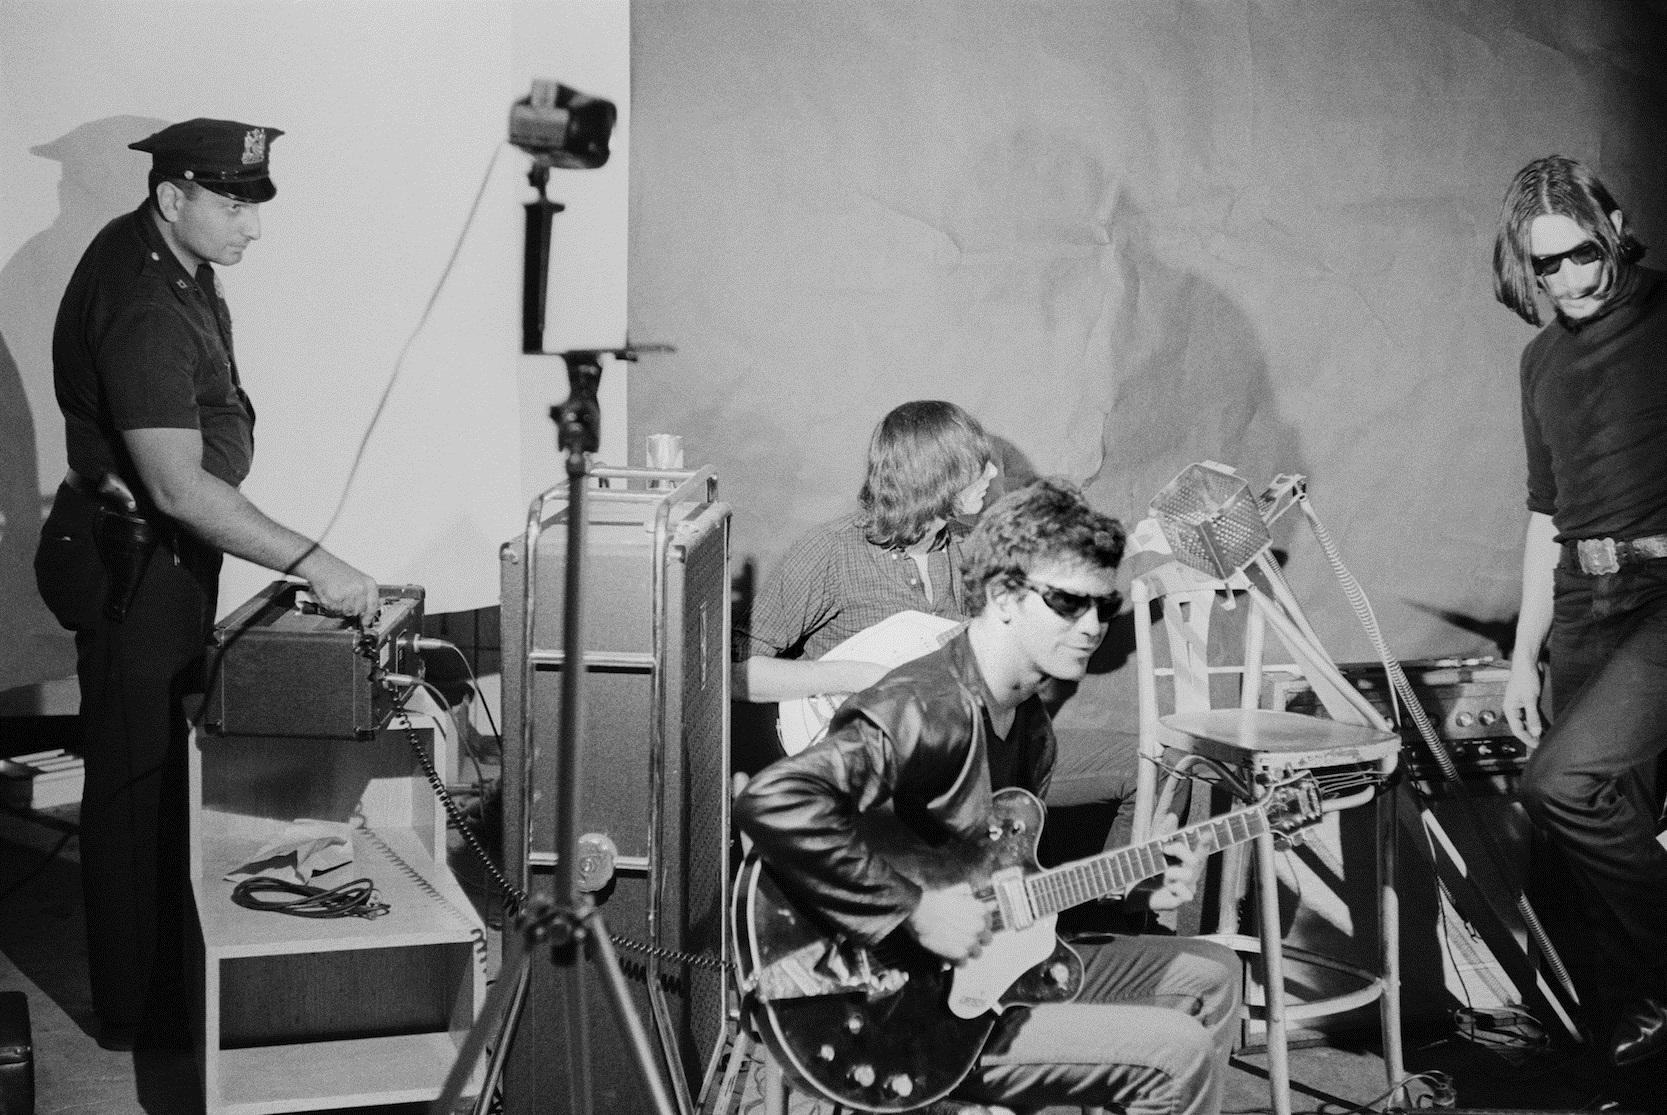 Todd Haynes finishes new documentary on The Velvet Underground